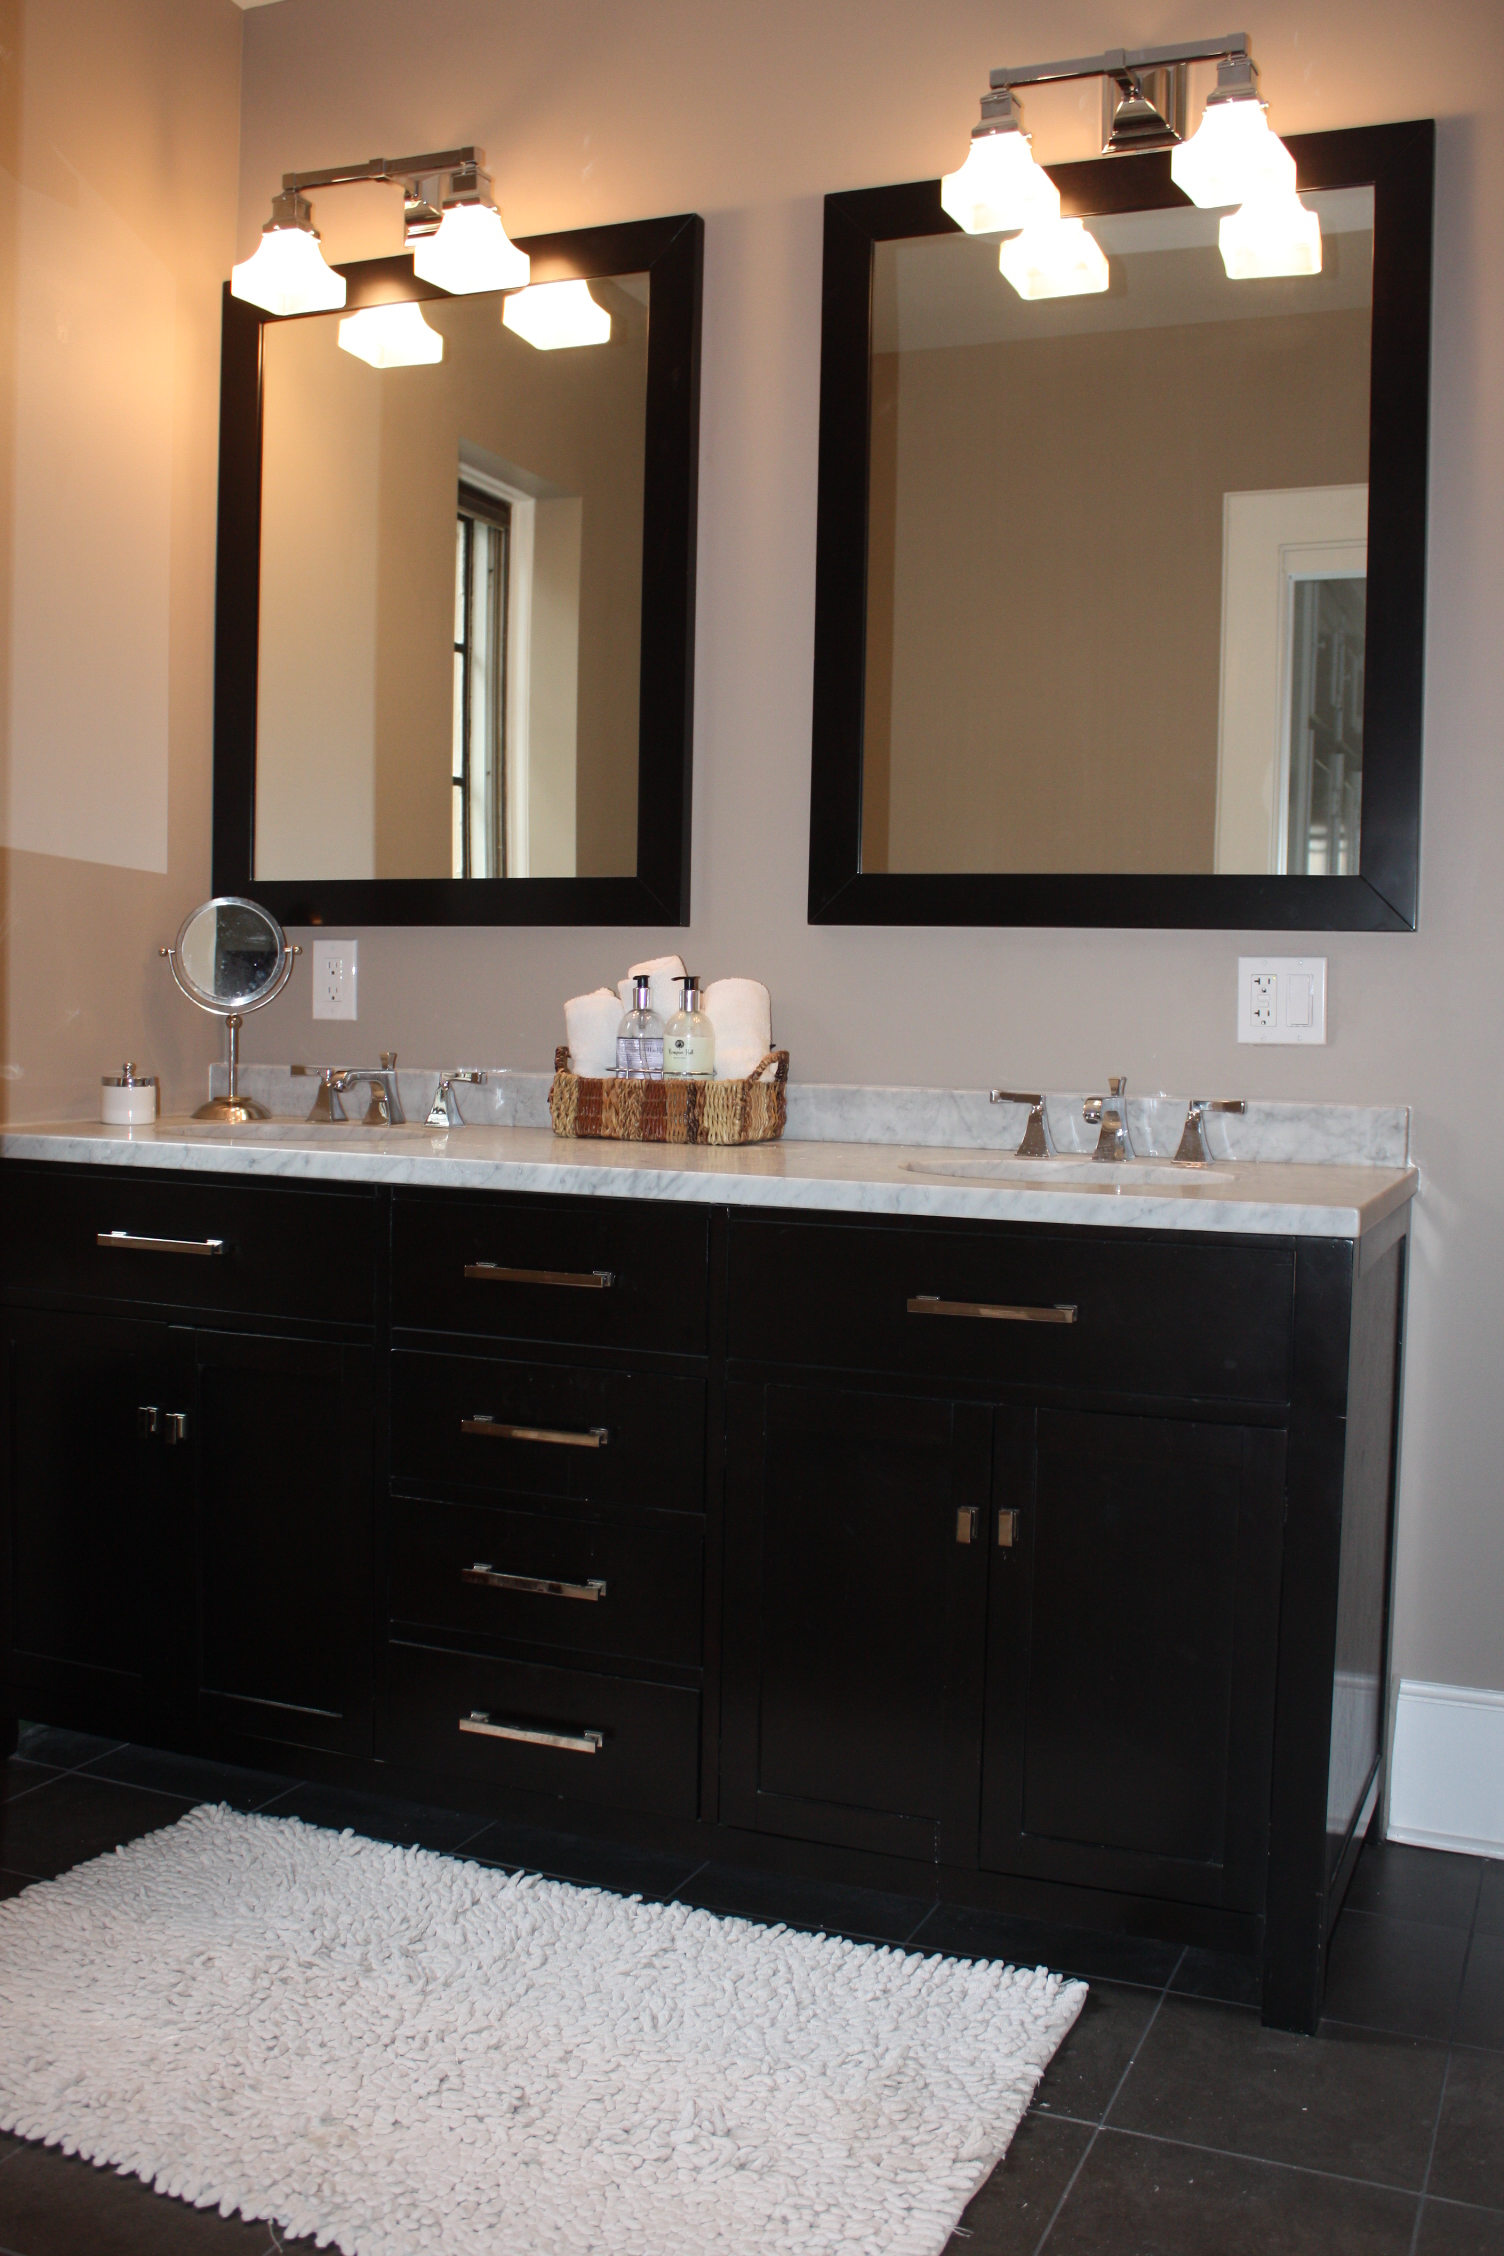 cvisions_bathroom_remodel4.JPG